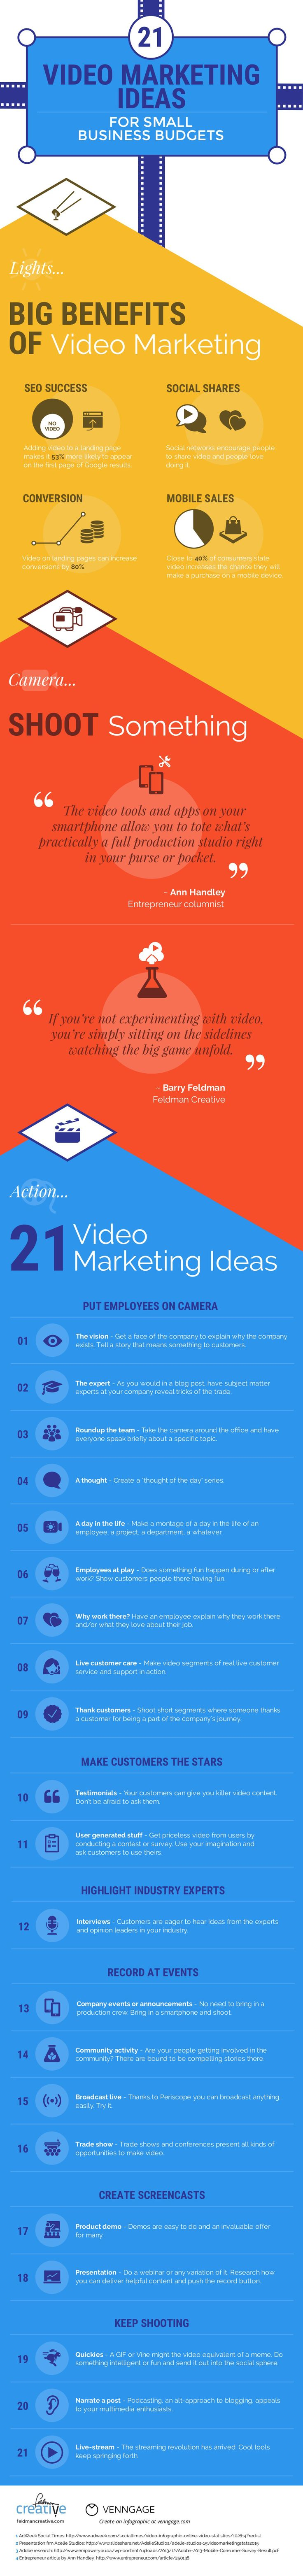 21 VÍDEO MARKETING IDEAS #INFOGRAPHIC #MARKETING